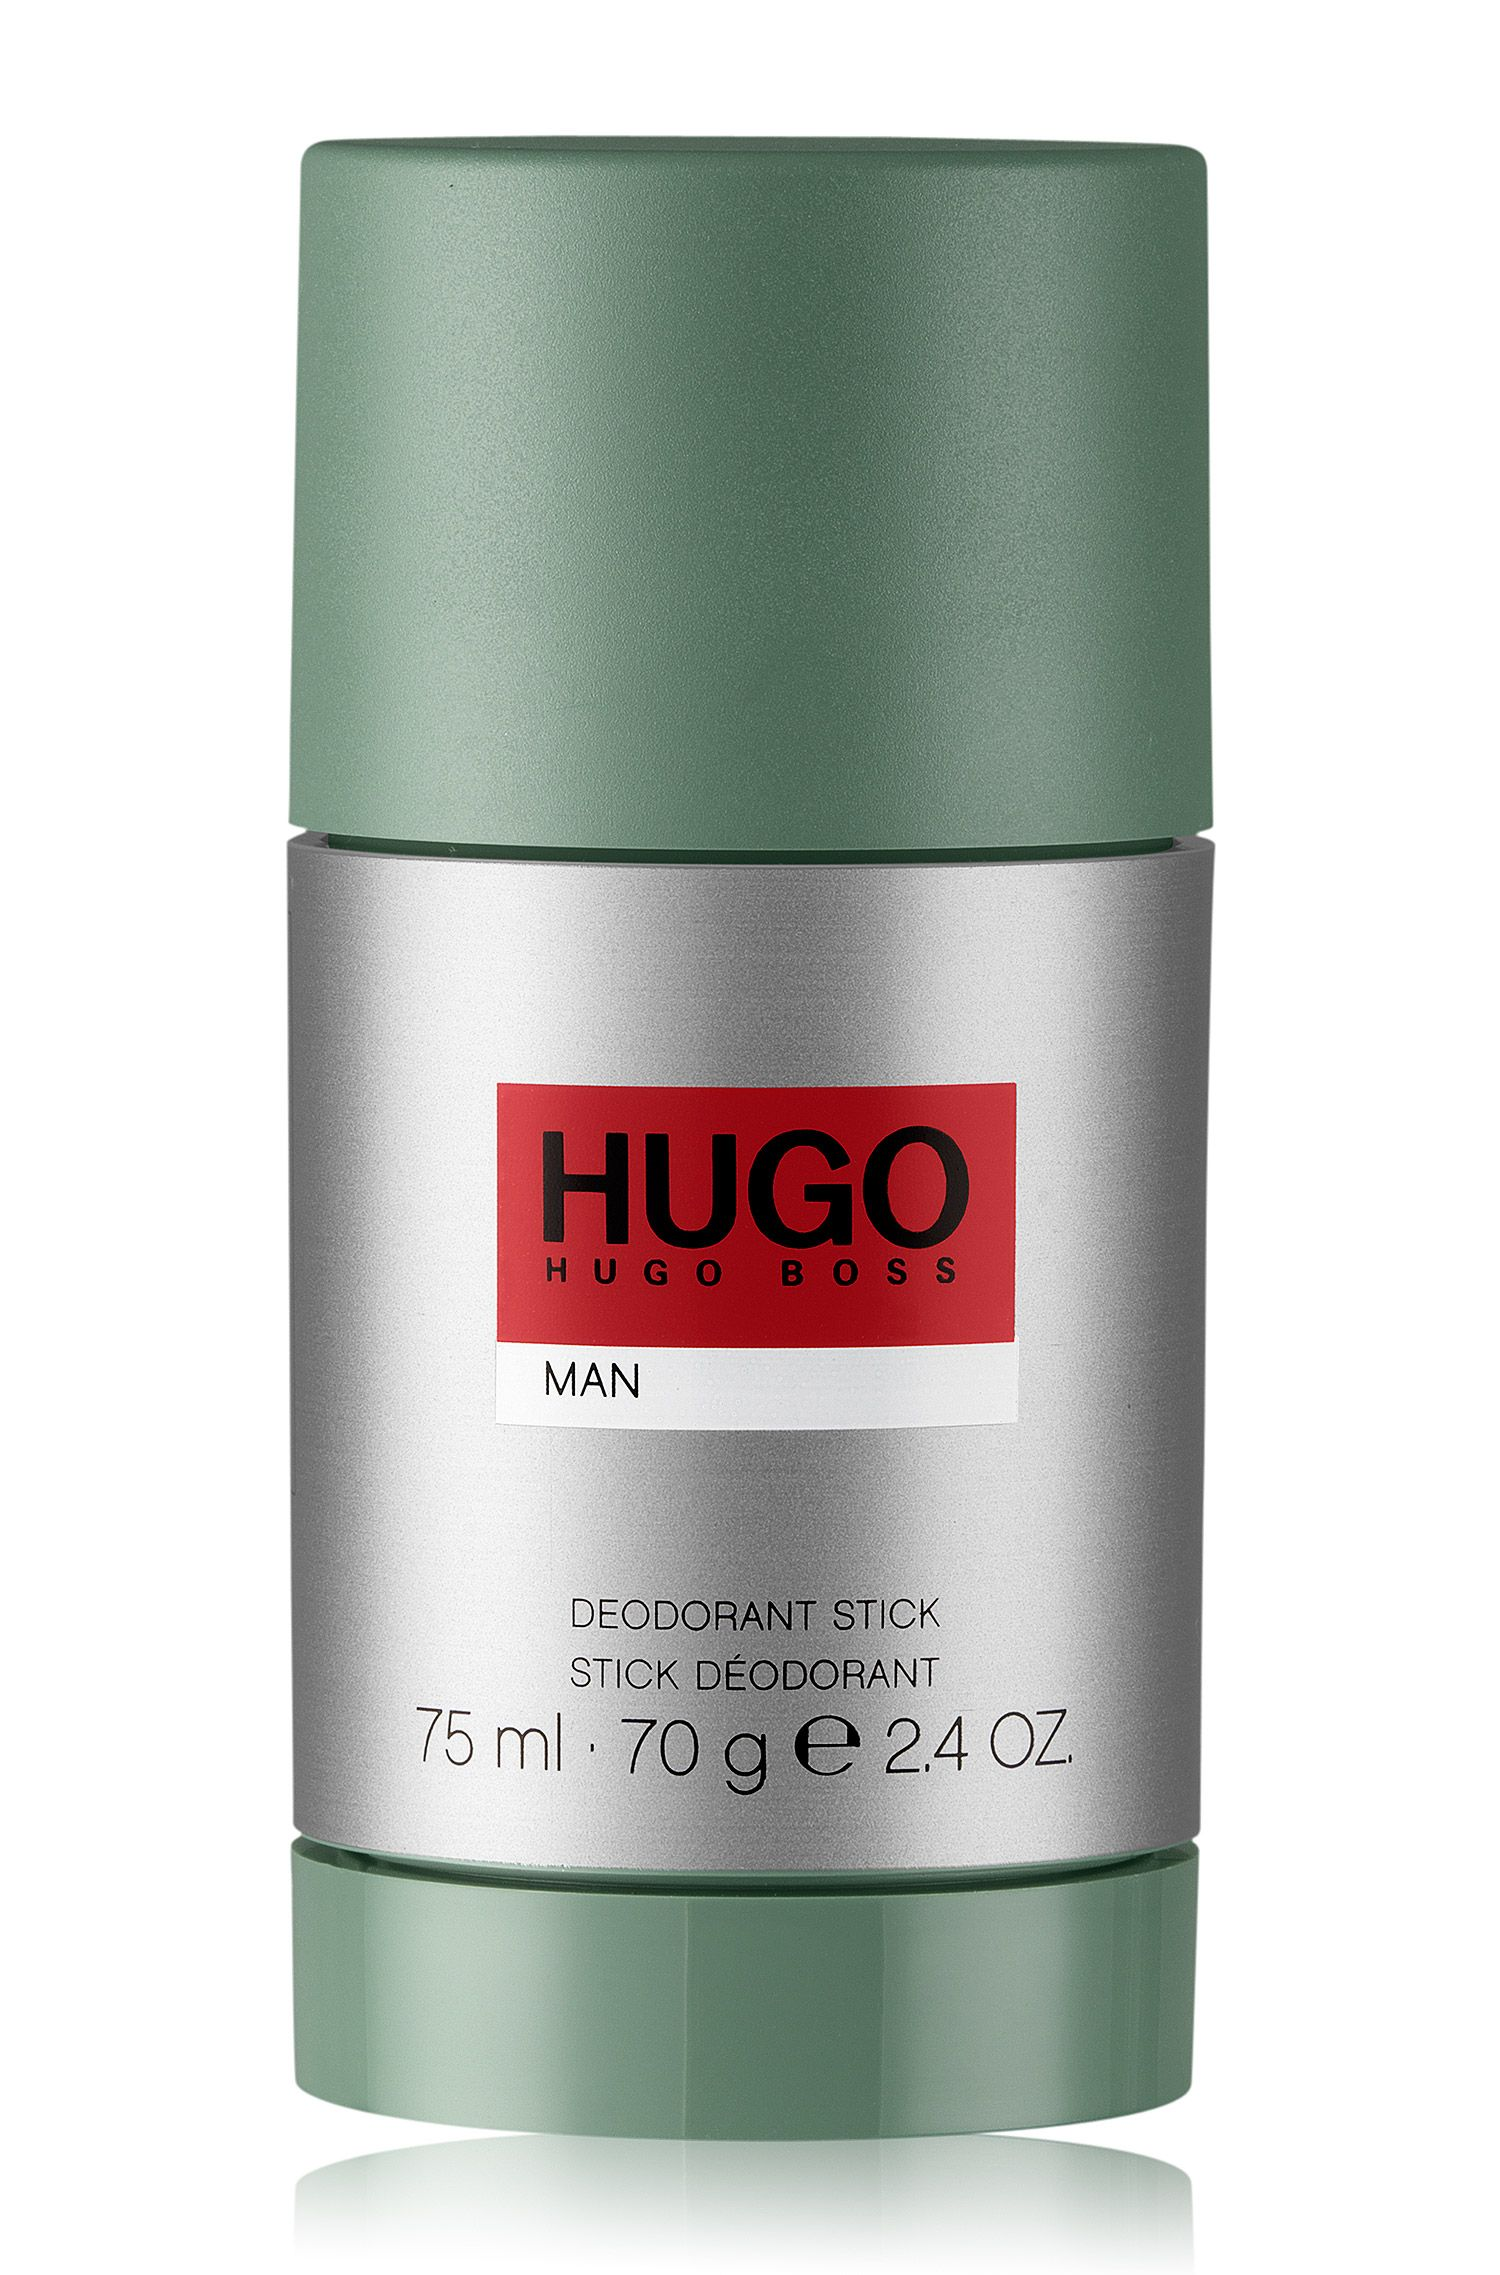 Déodorant Stick HUGO Man, 75ml